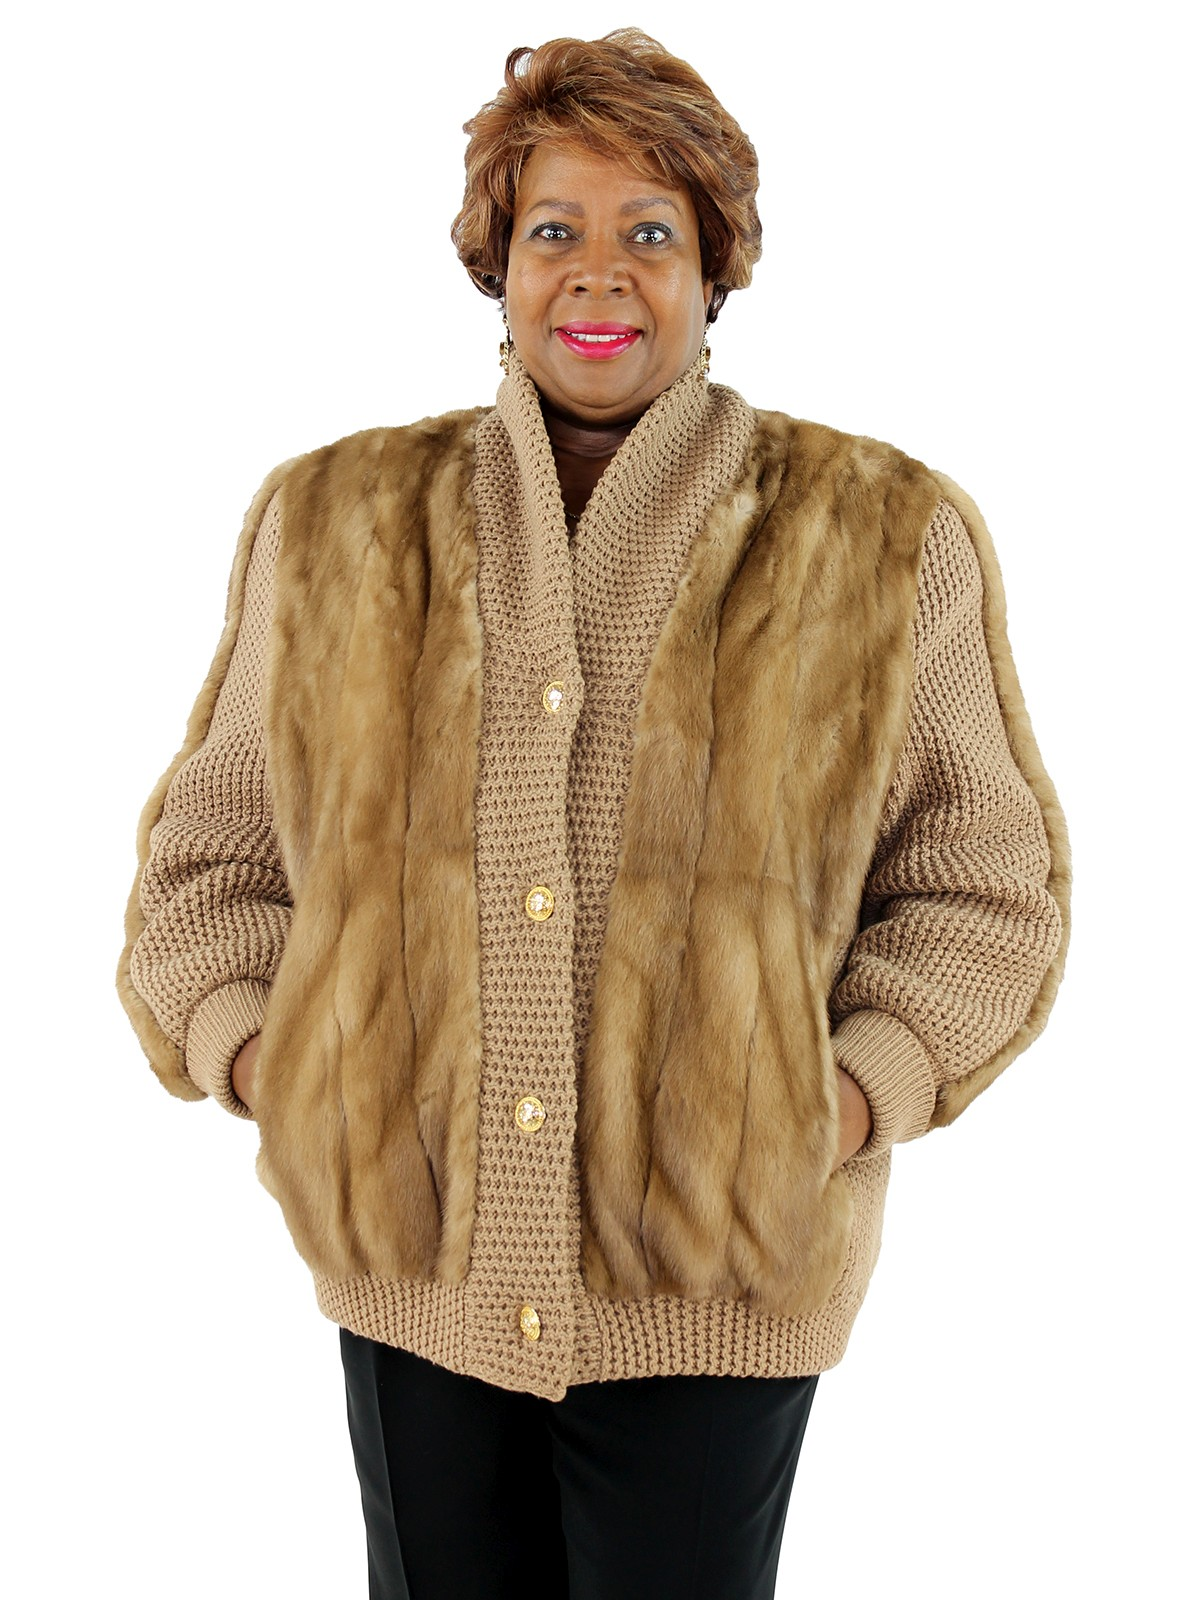 Woman's Autumn Haze Mink Fur and Knit Jacket